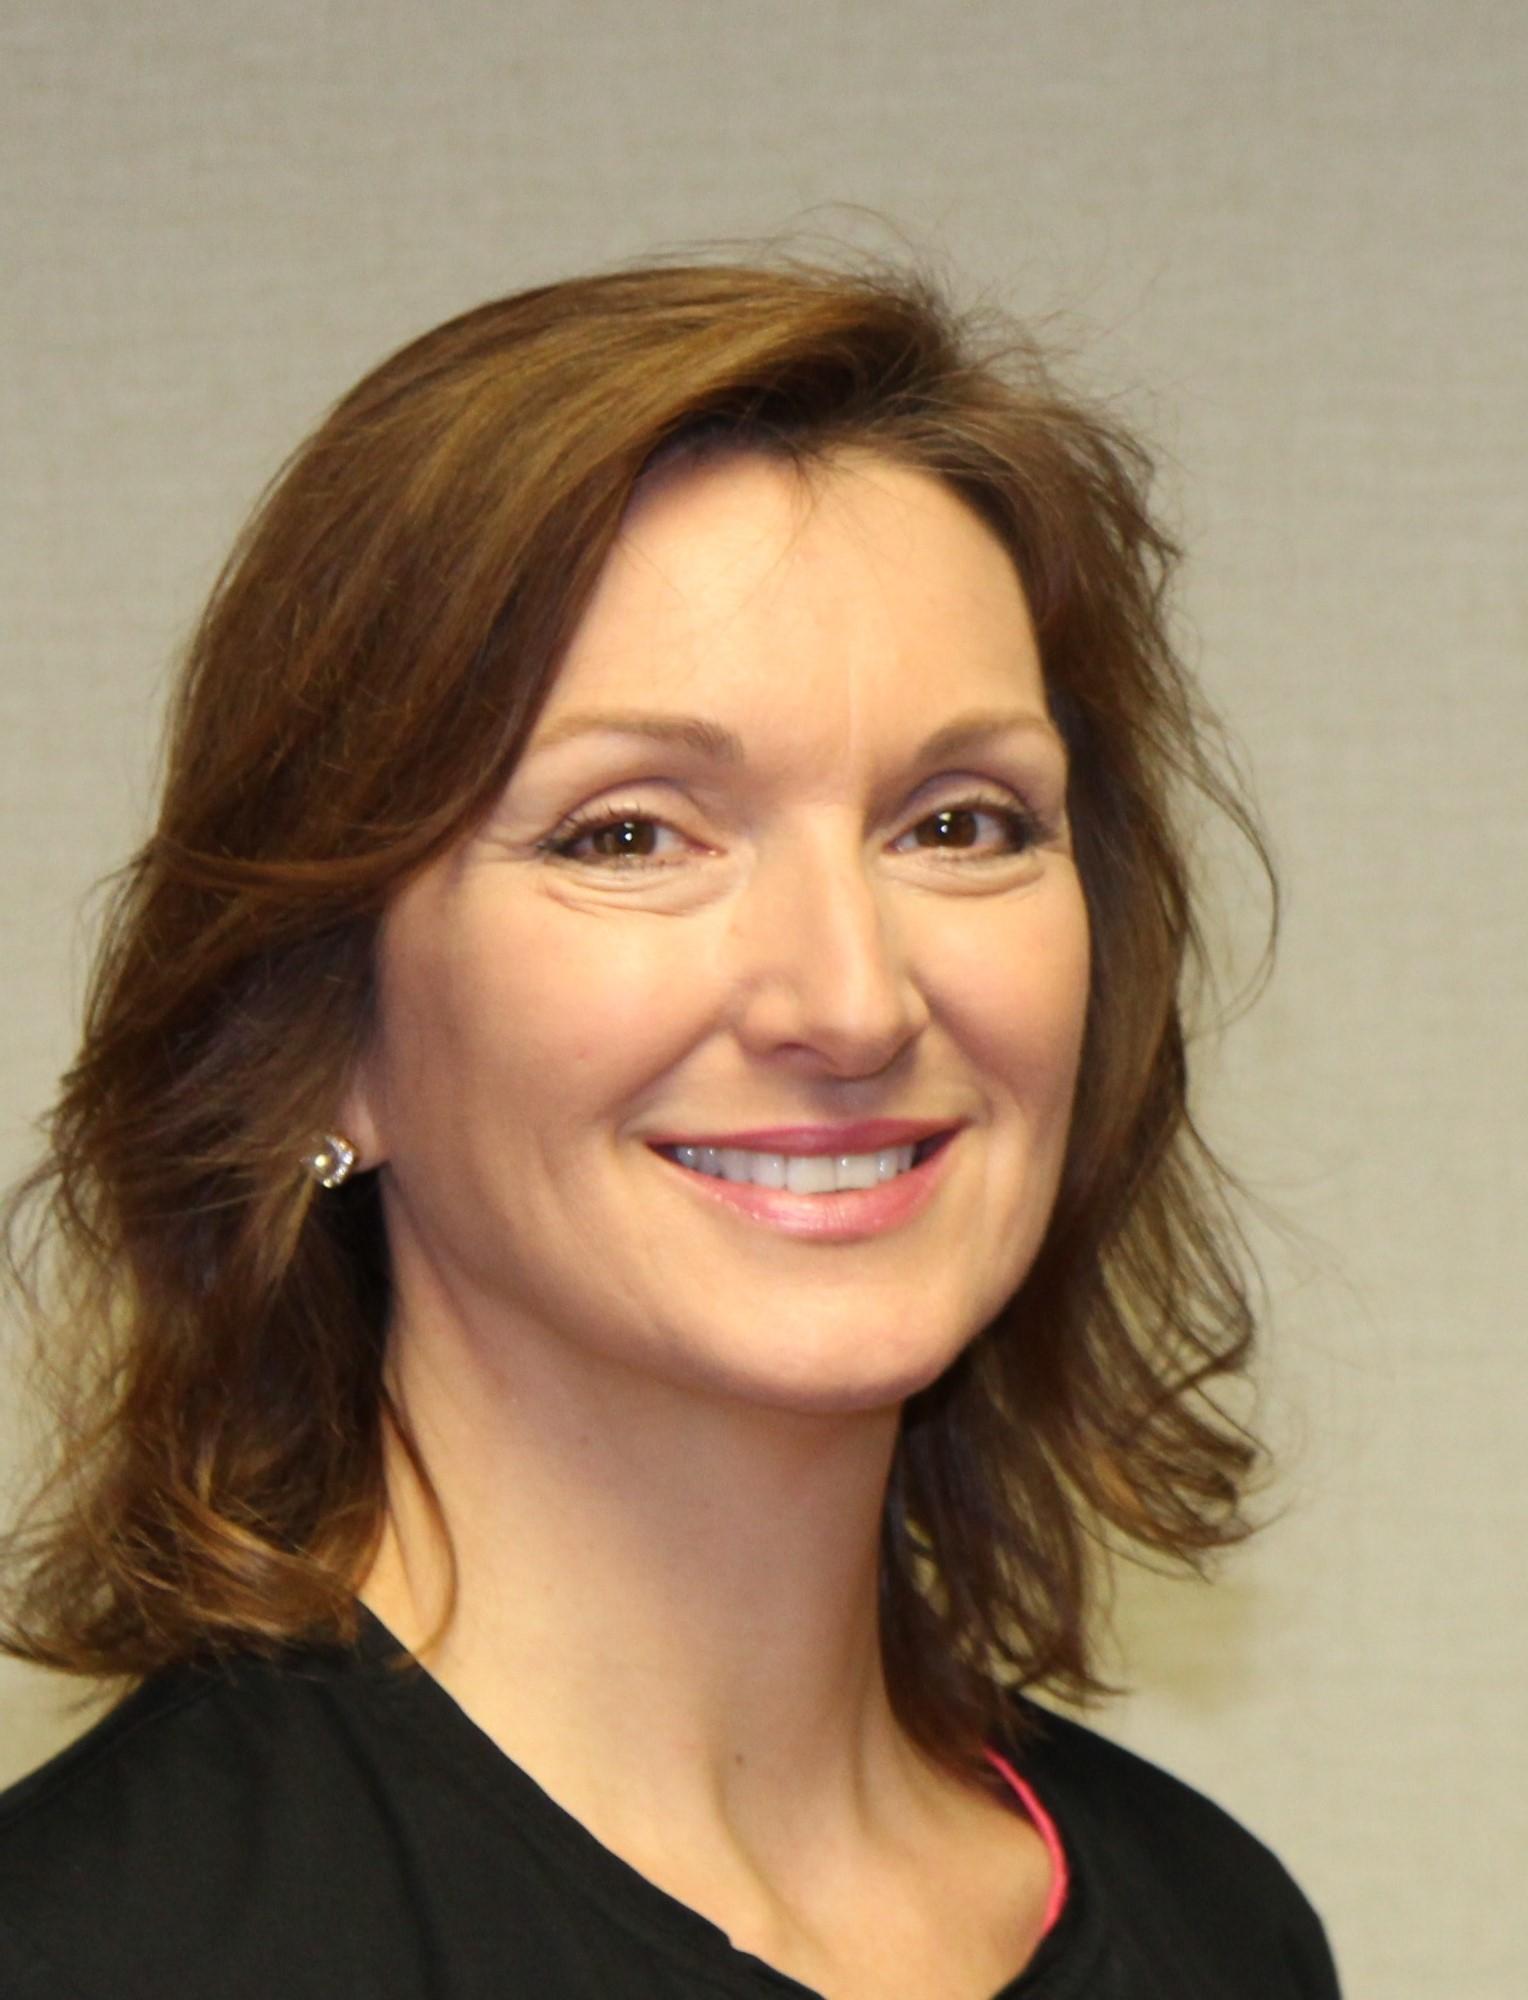 Julie Sannito, Hygienist picture